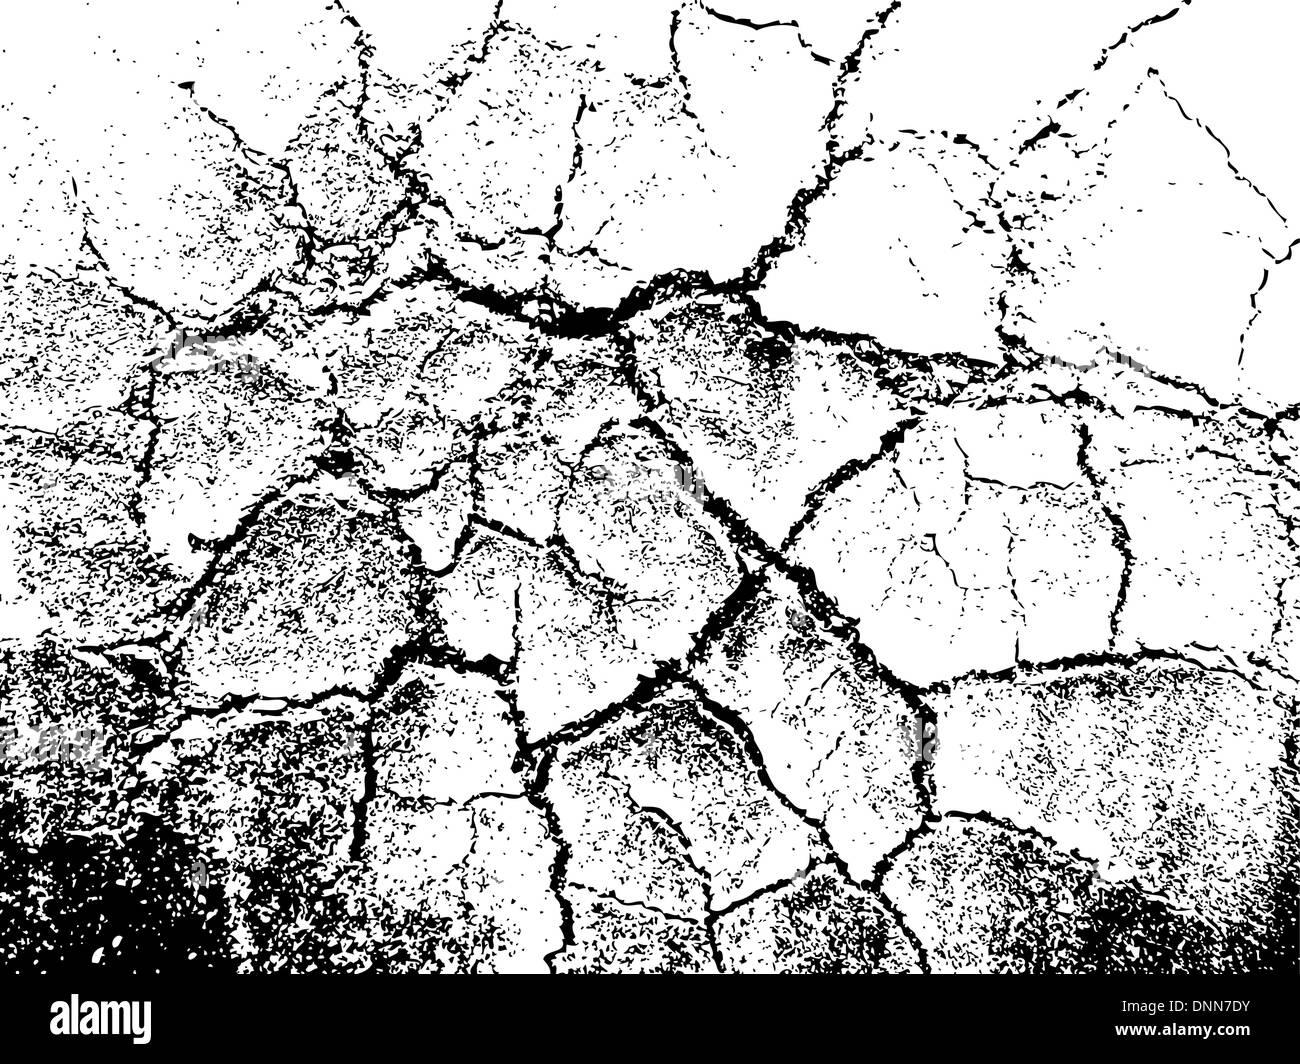 Textura grunge agrietado Imagen De Stock